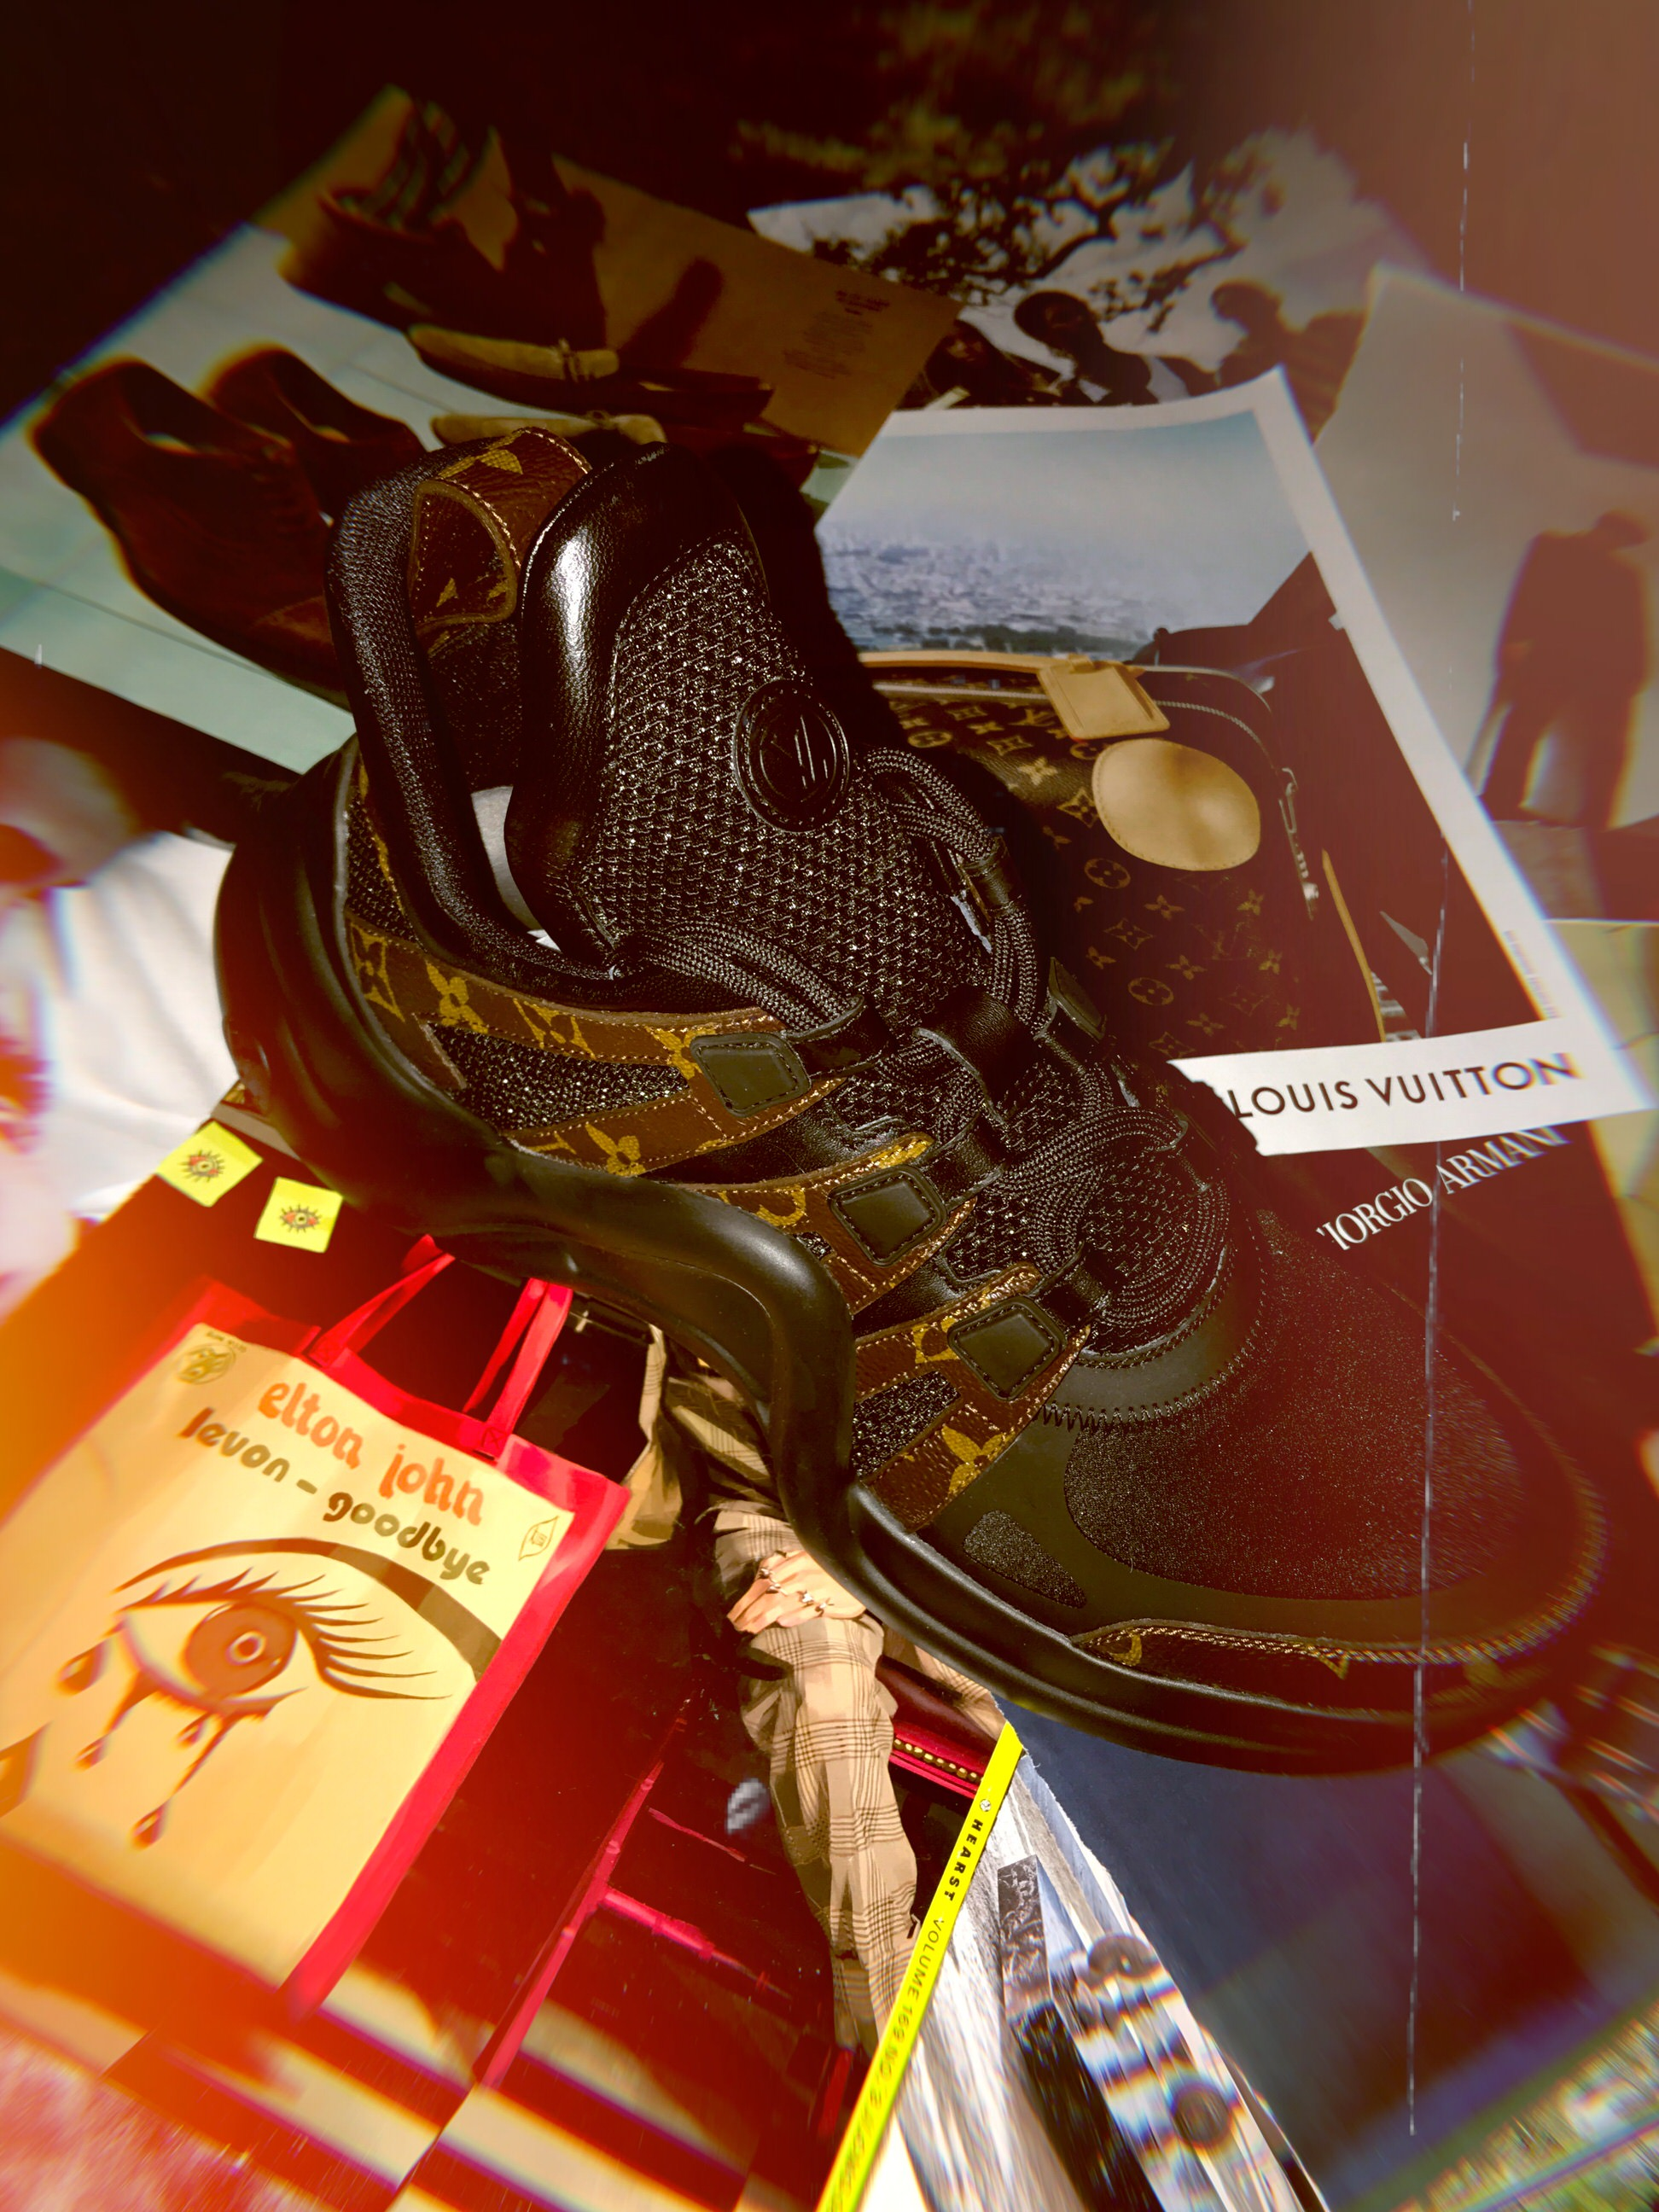 mybelonging-louis-vuitton-archlight-sneakers-ugly-luxury-sneaker-trend2.JPG